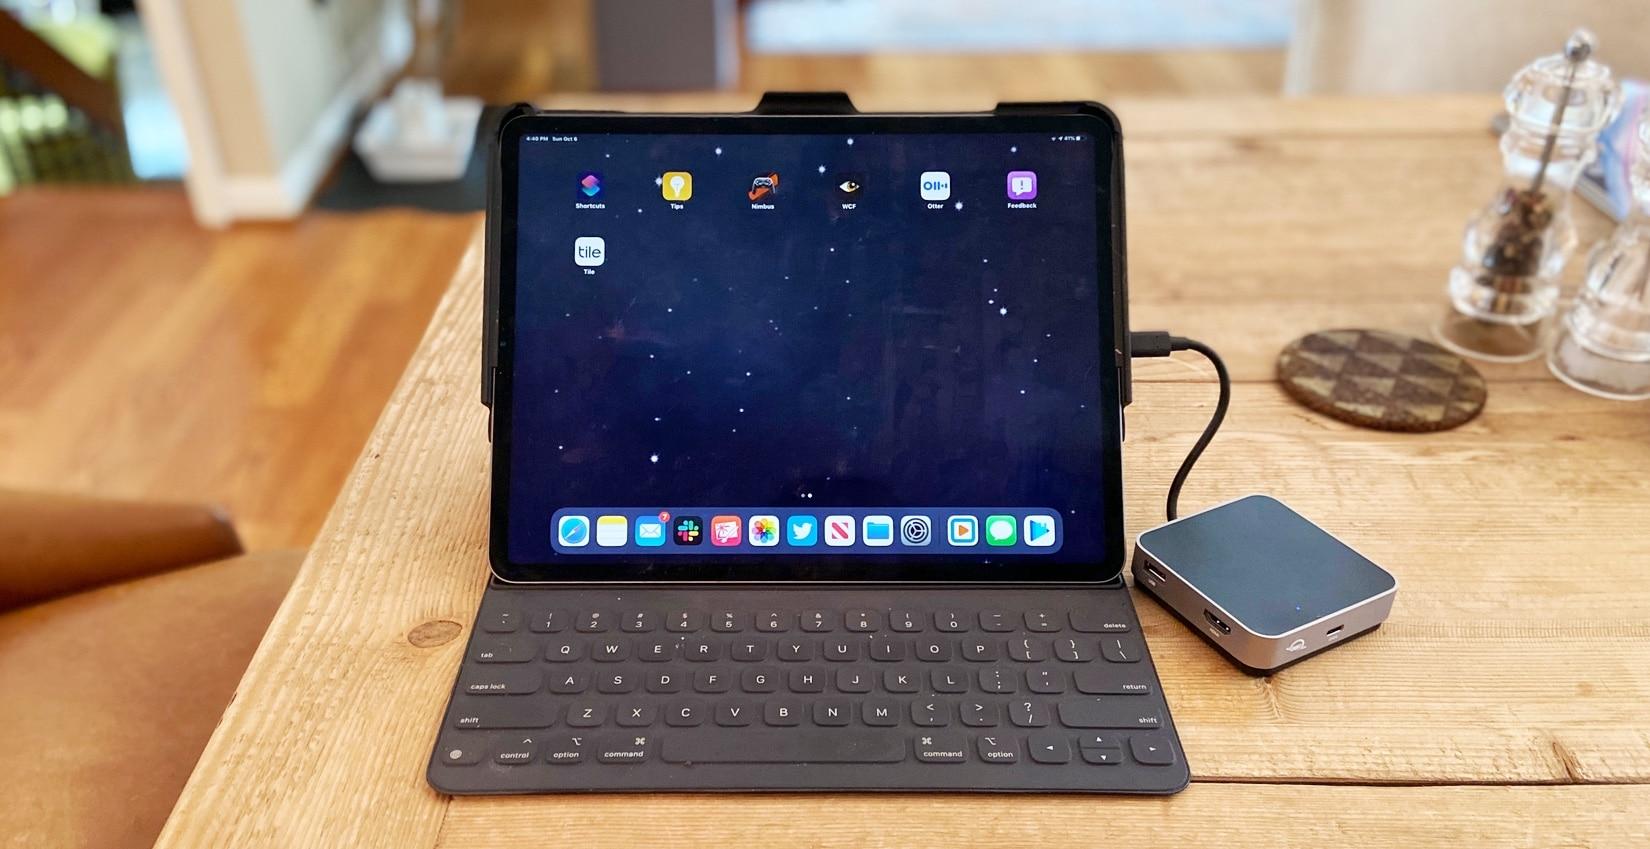 OWC USB-C Travel Dock with iPad Pro